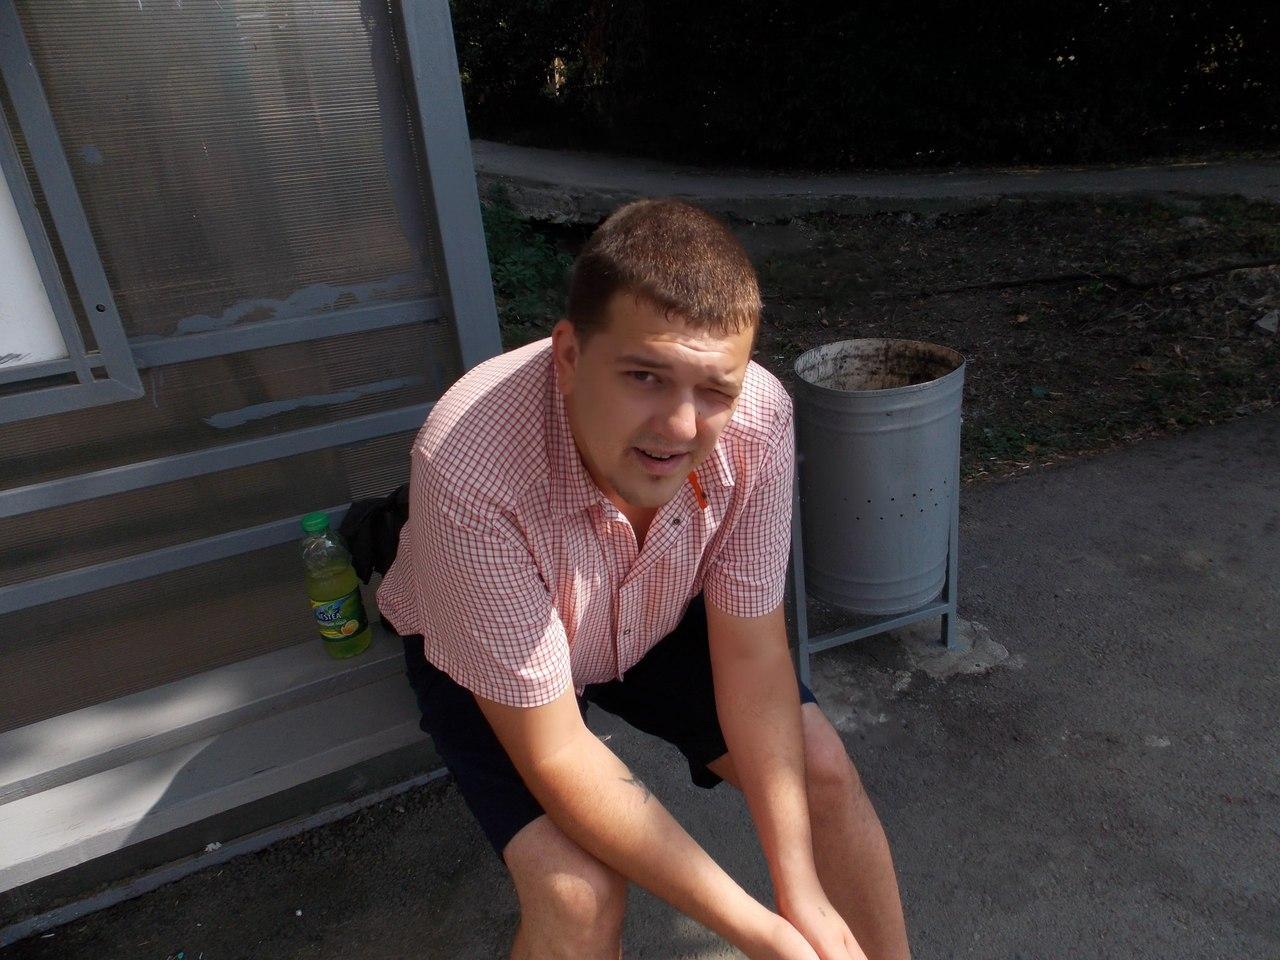 Артем Лямкин, Екатеринбург - фото №11